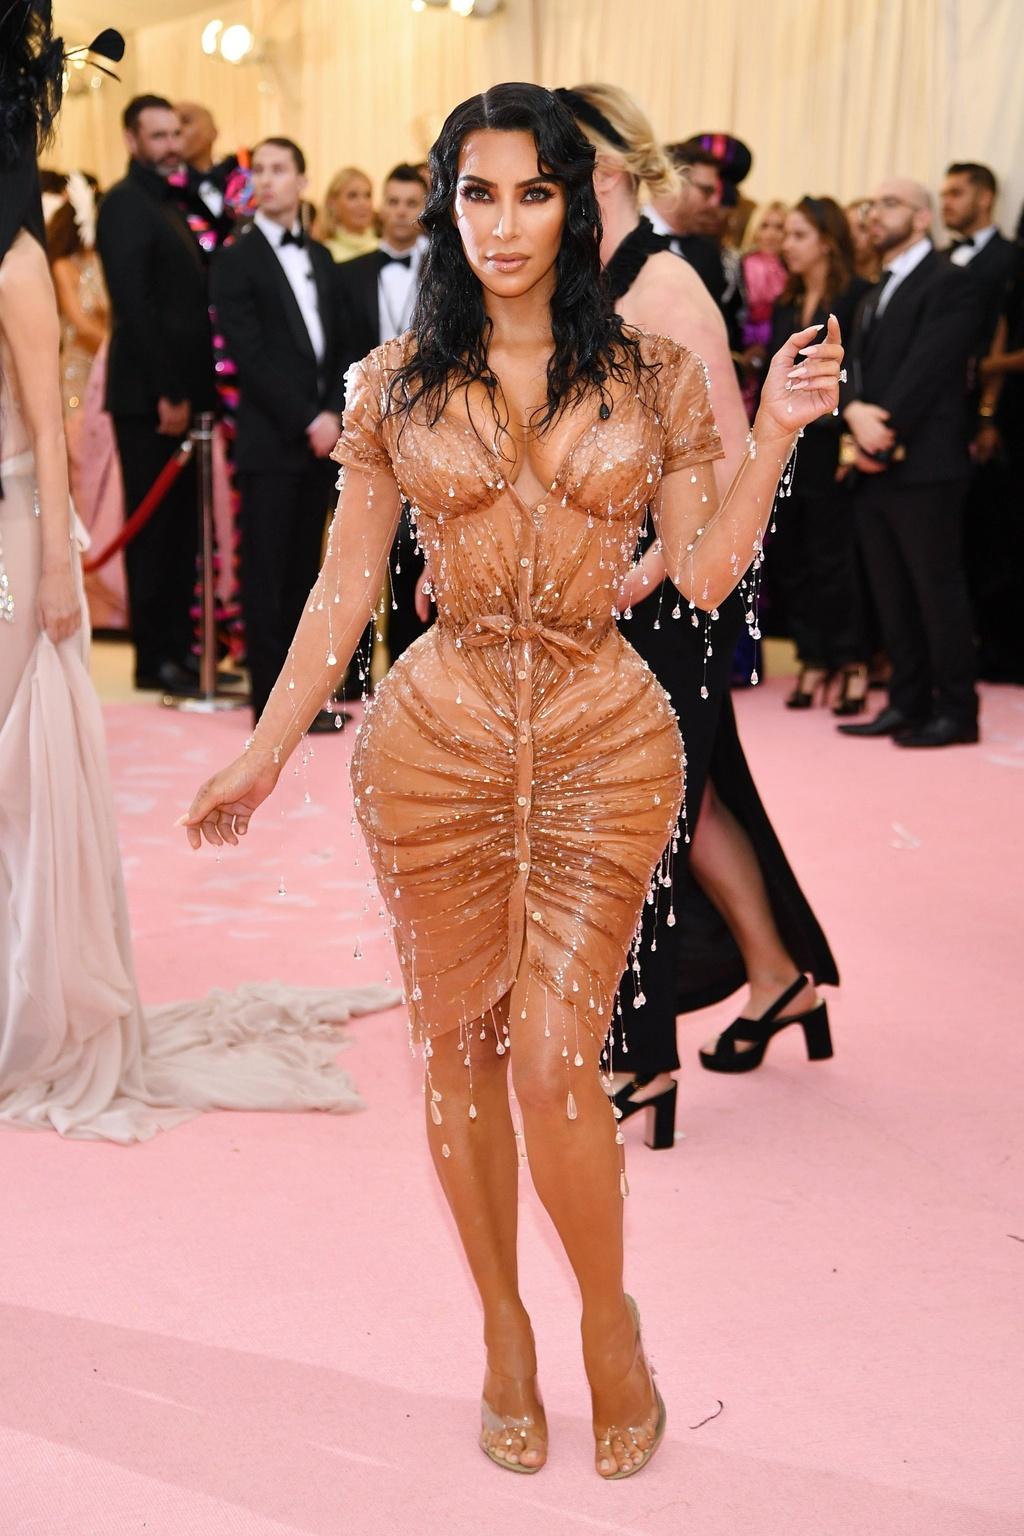 Kim Kardashian o ep vong mot va loat khoanh khac an tuong nhat 2019 hinh anh 7 kardashian_jenner_metgala_5_6_19_13.jpg